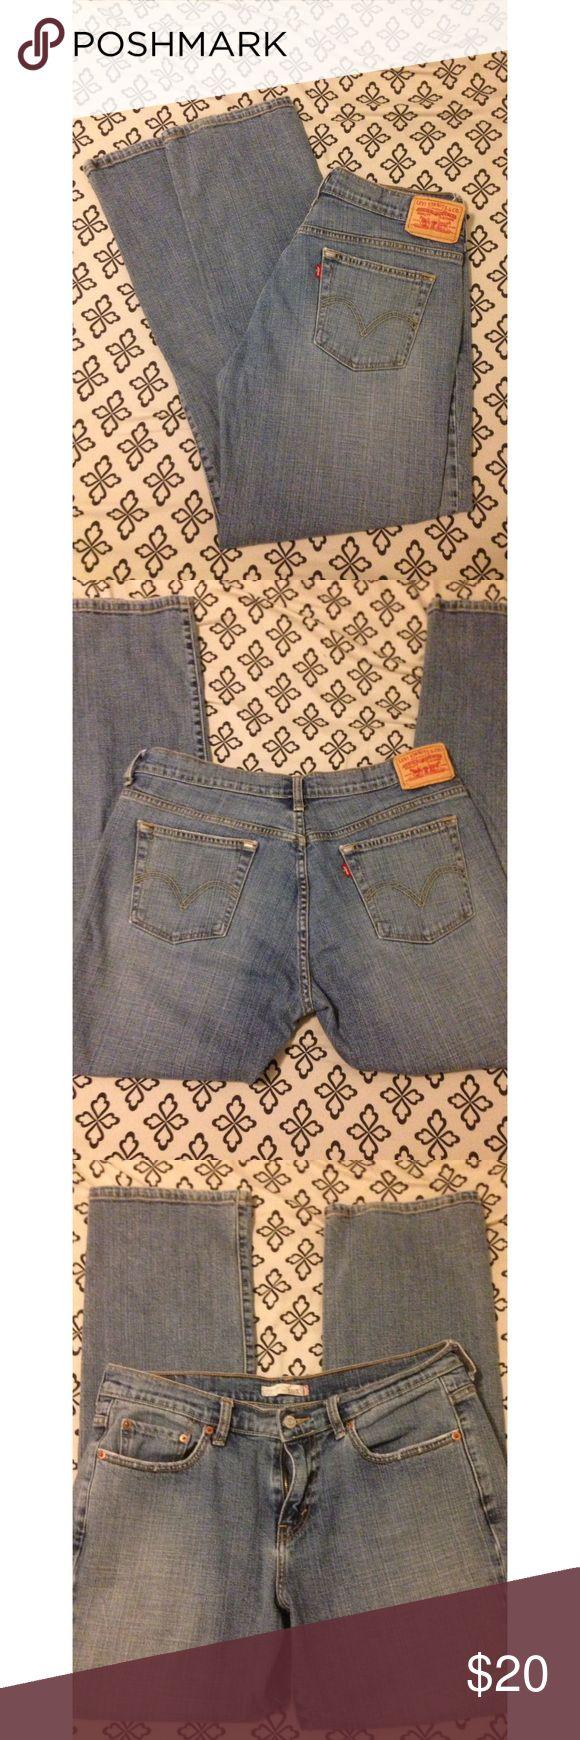 Levi Jeans 505 straight leg Levis 505 jeans. Straight leg. Great condition. Size 10 M Levi's Jeans Straight Leg